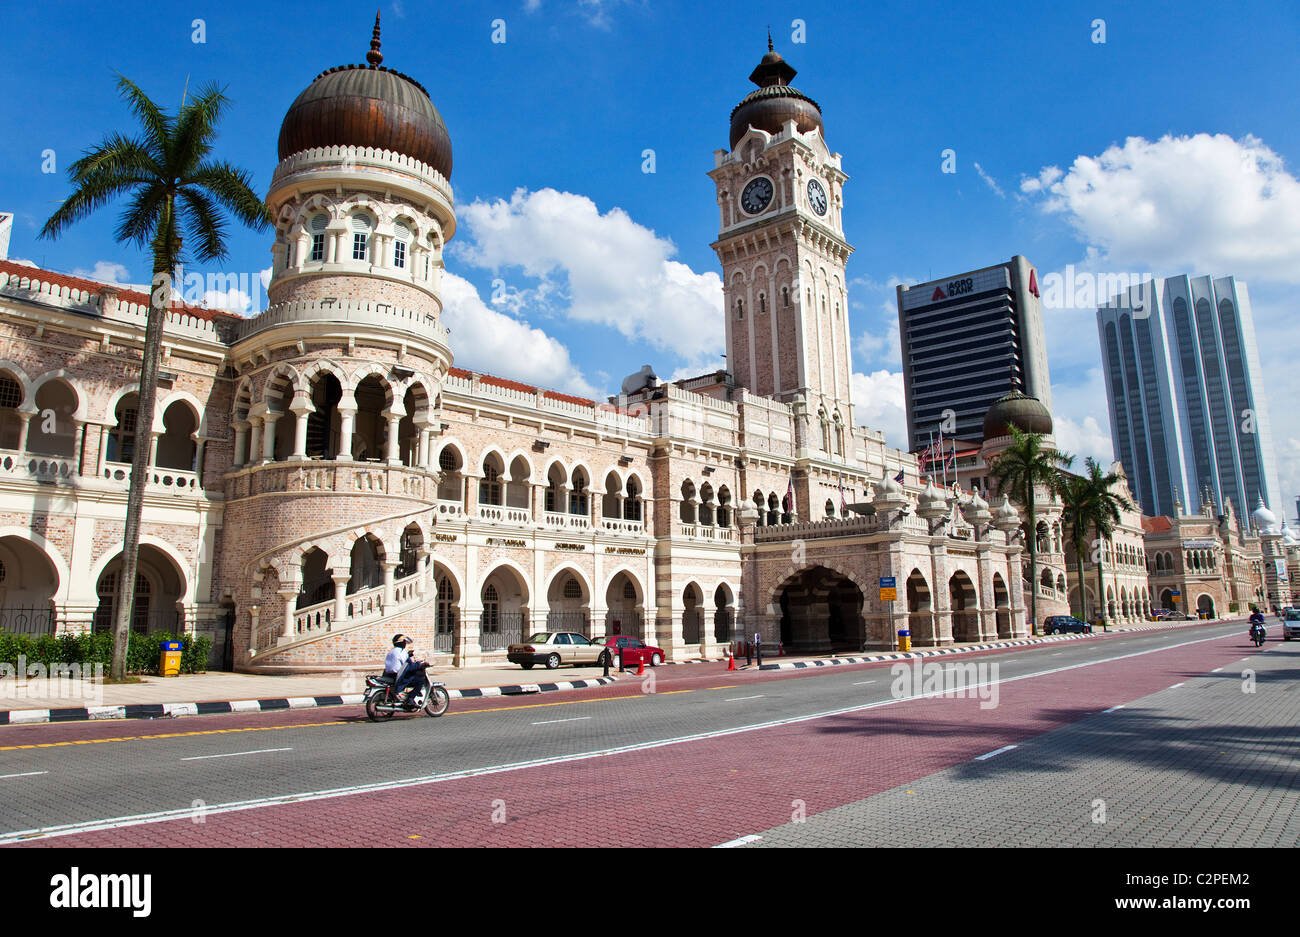 Sultan Abdul Samad Building, Kuala Lumpur - Stock Image